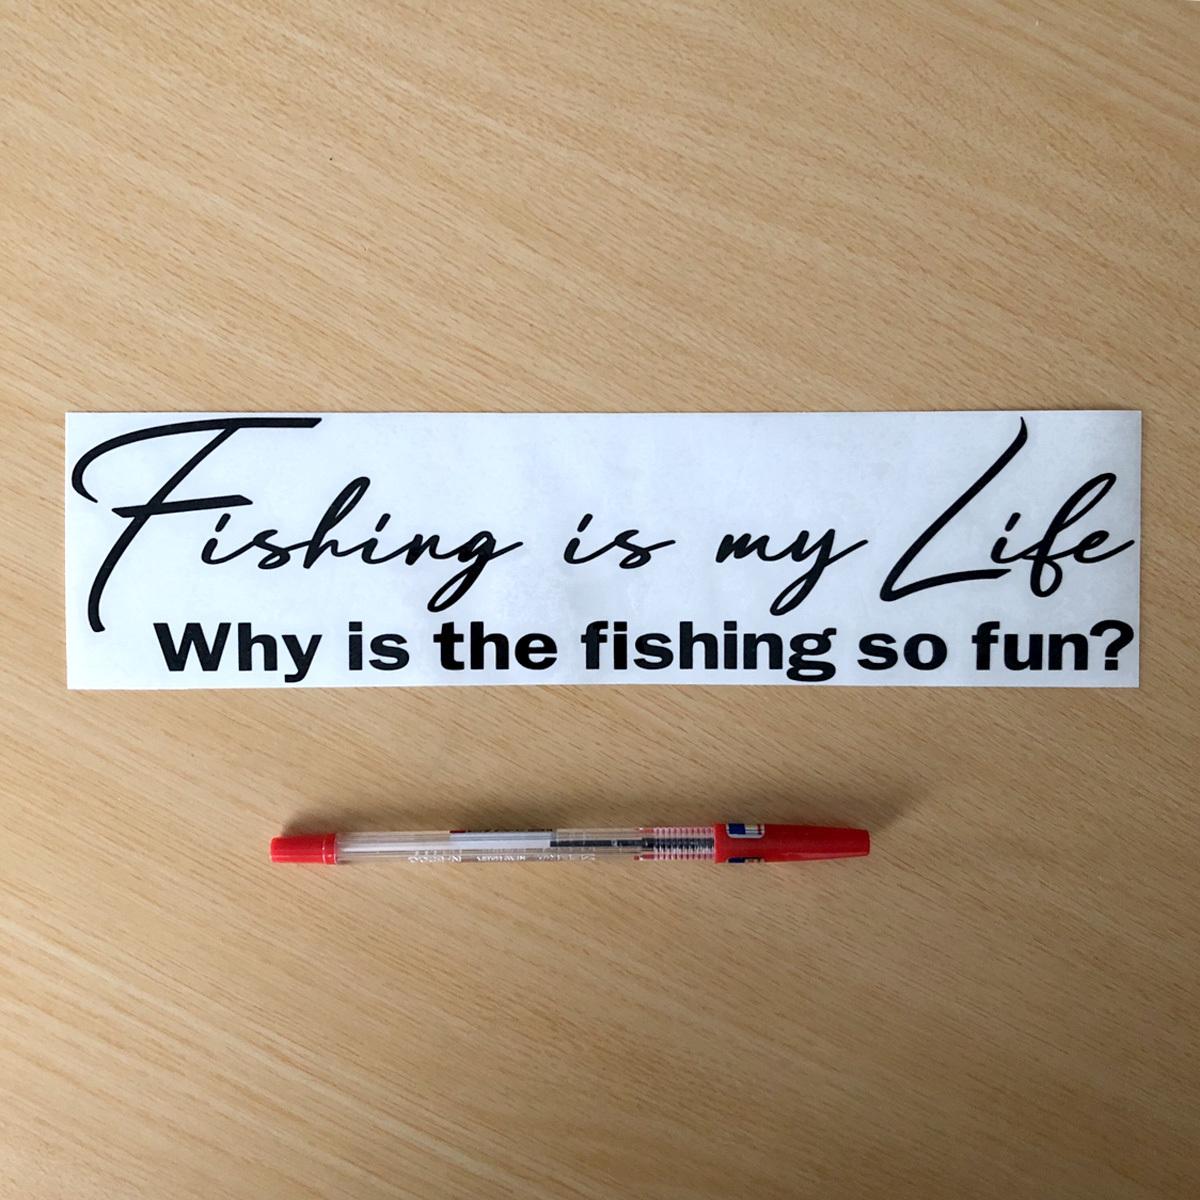 Fishing is my Life!(手書き風文字)カッティングステッカー Why is the fishing so fun?どうして釣りはこんなに楽しいのか?NO519_画像5